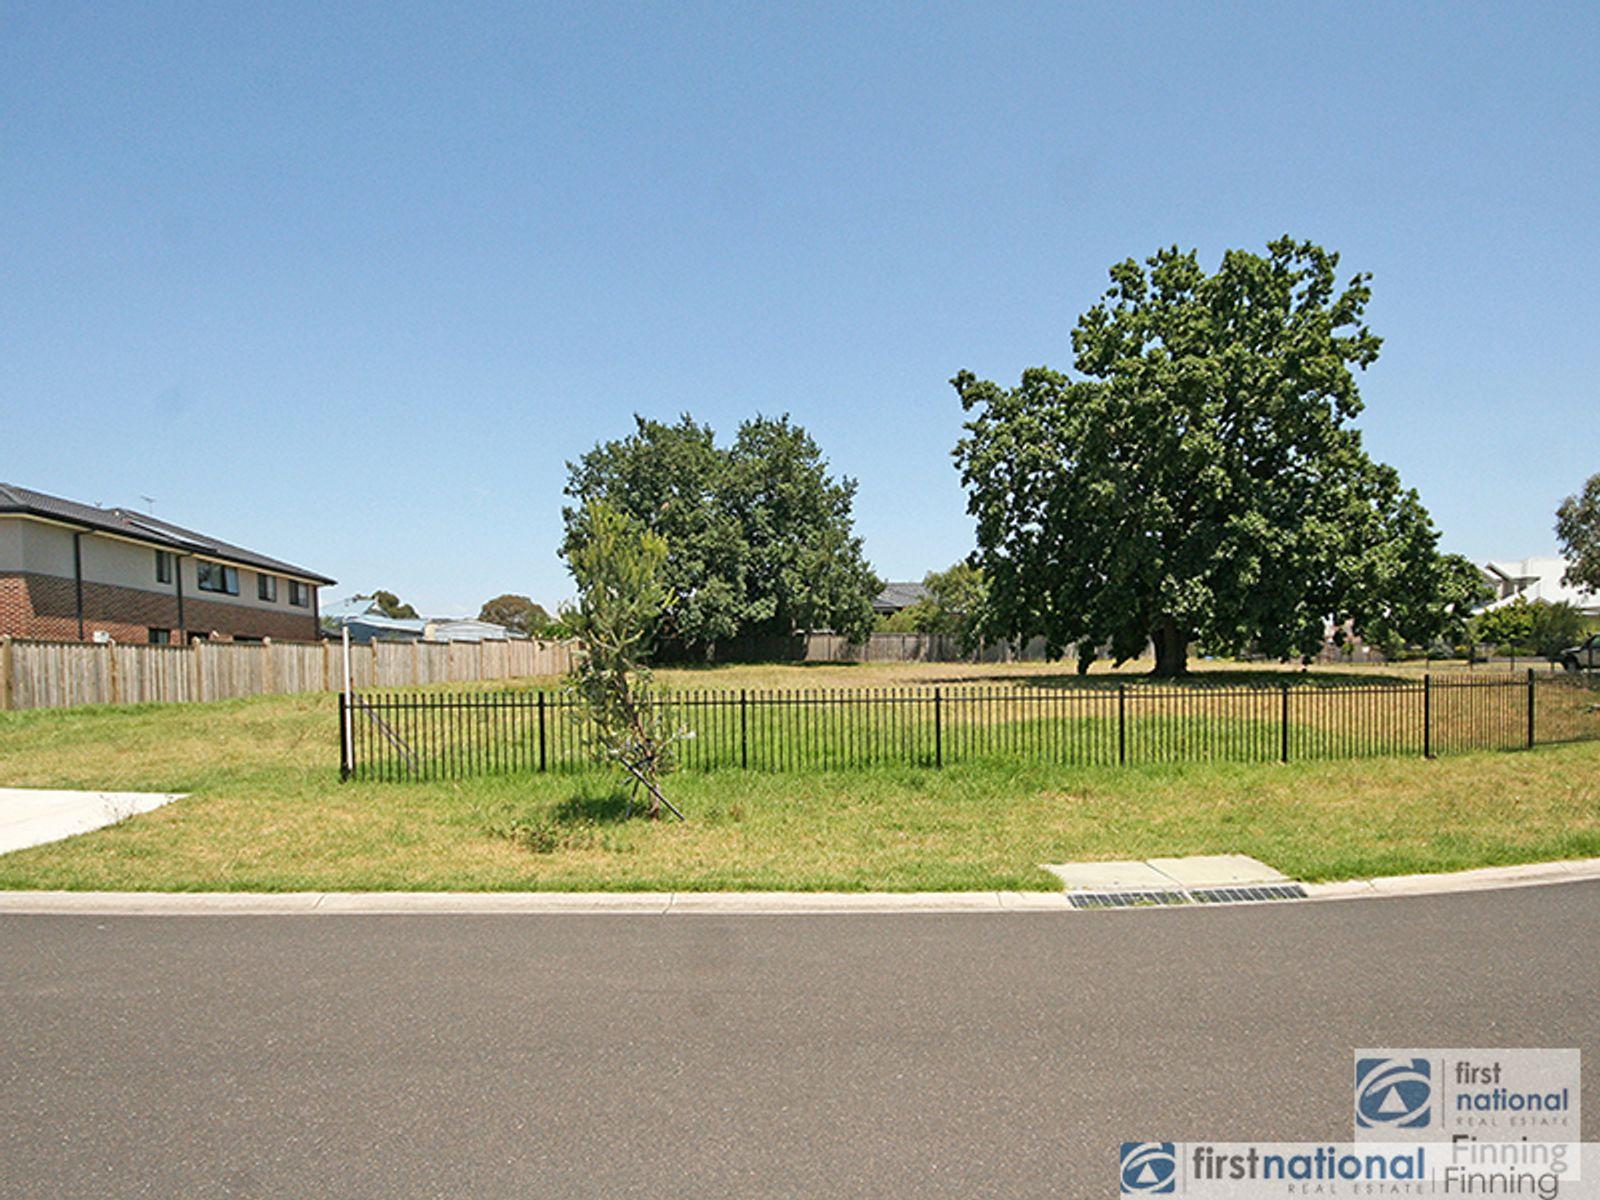 4 Hilda Way, Cranbourne, VIC 3977